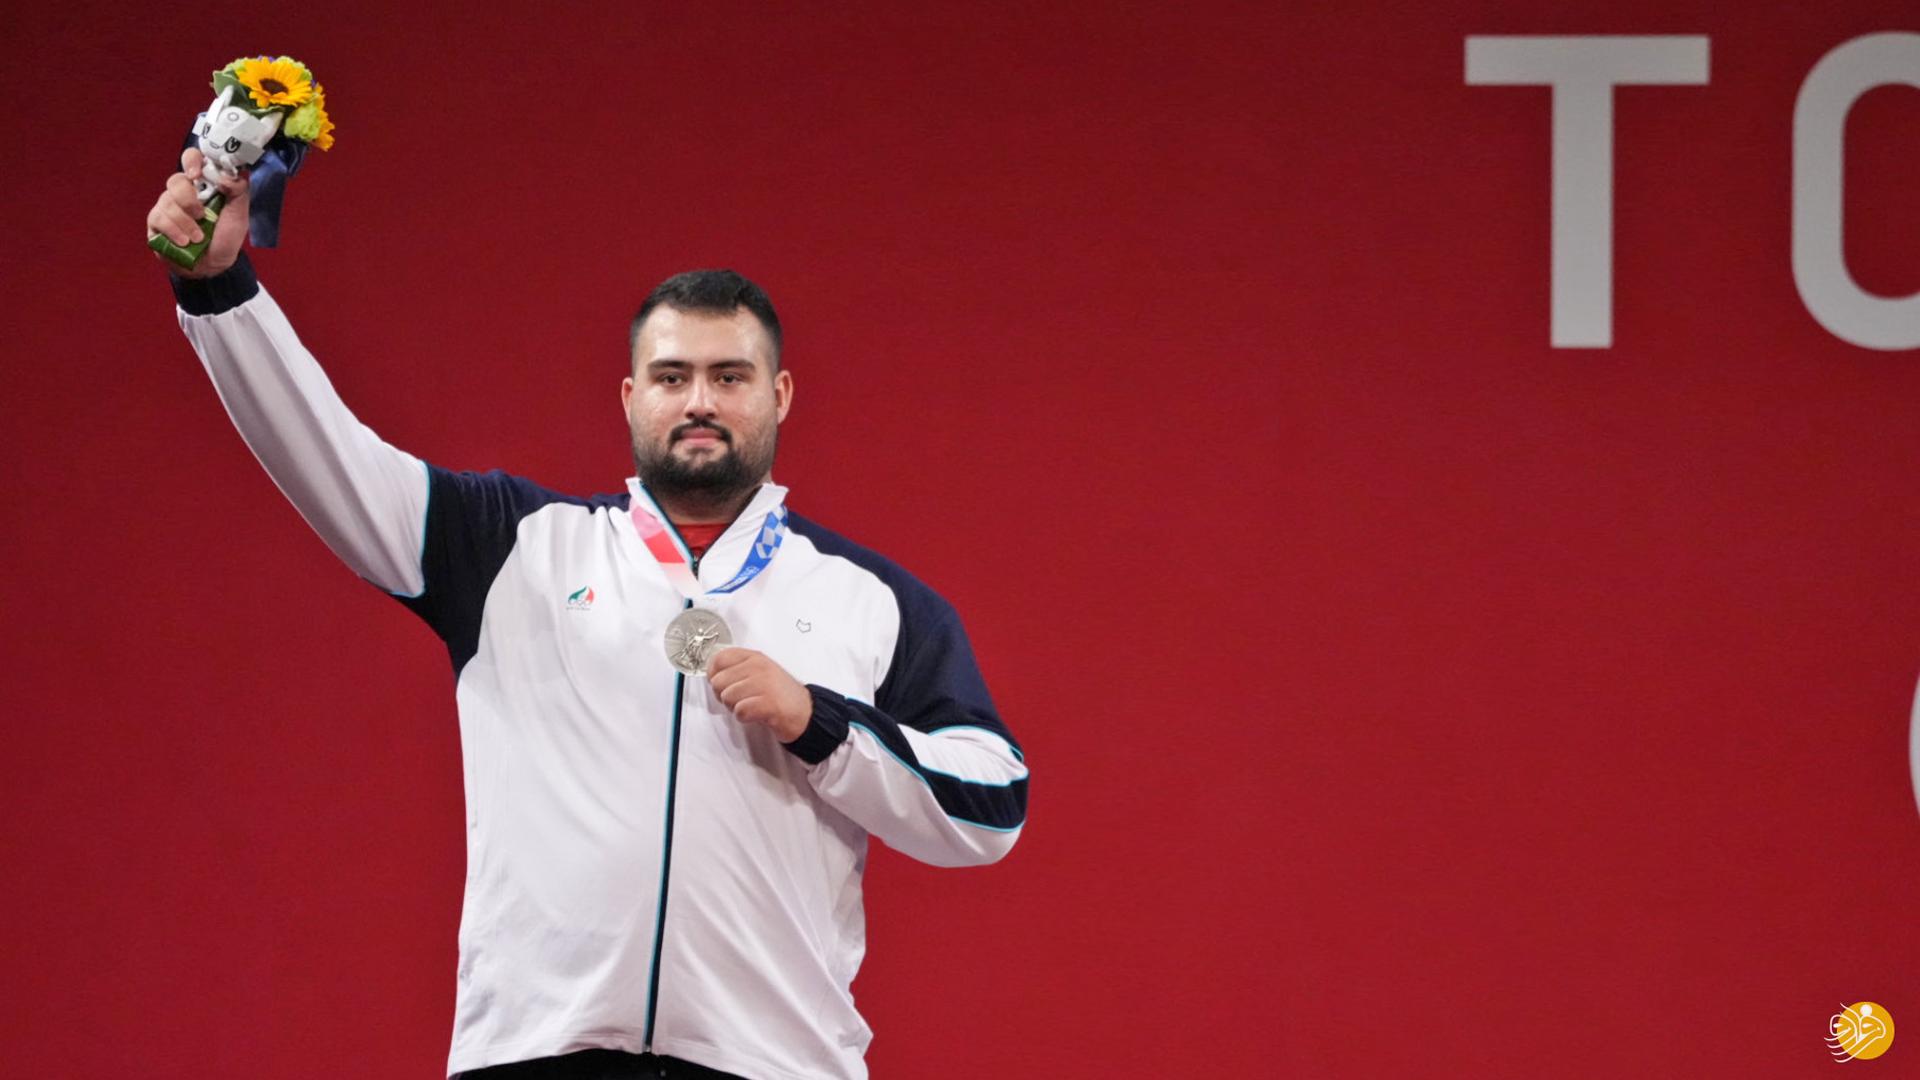 Tokyo Olympics: Iran weightlifter Ali Davoudi takes silver in +109 KG